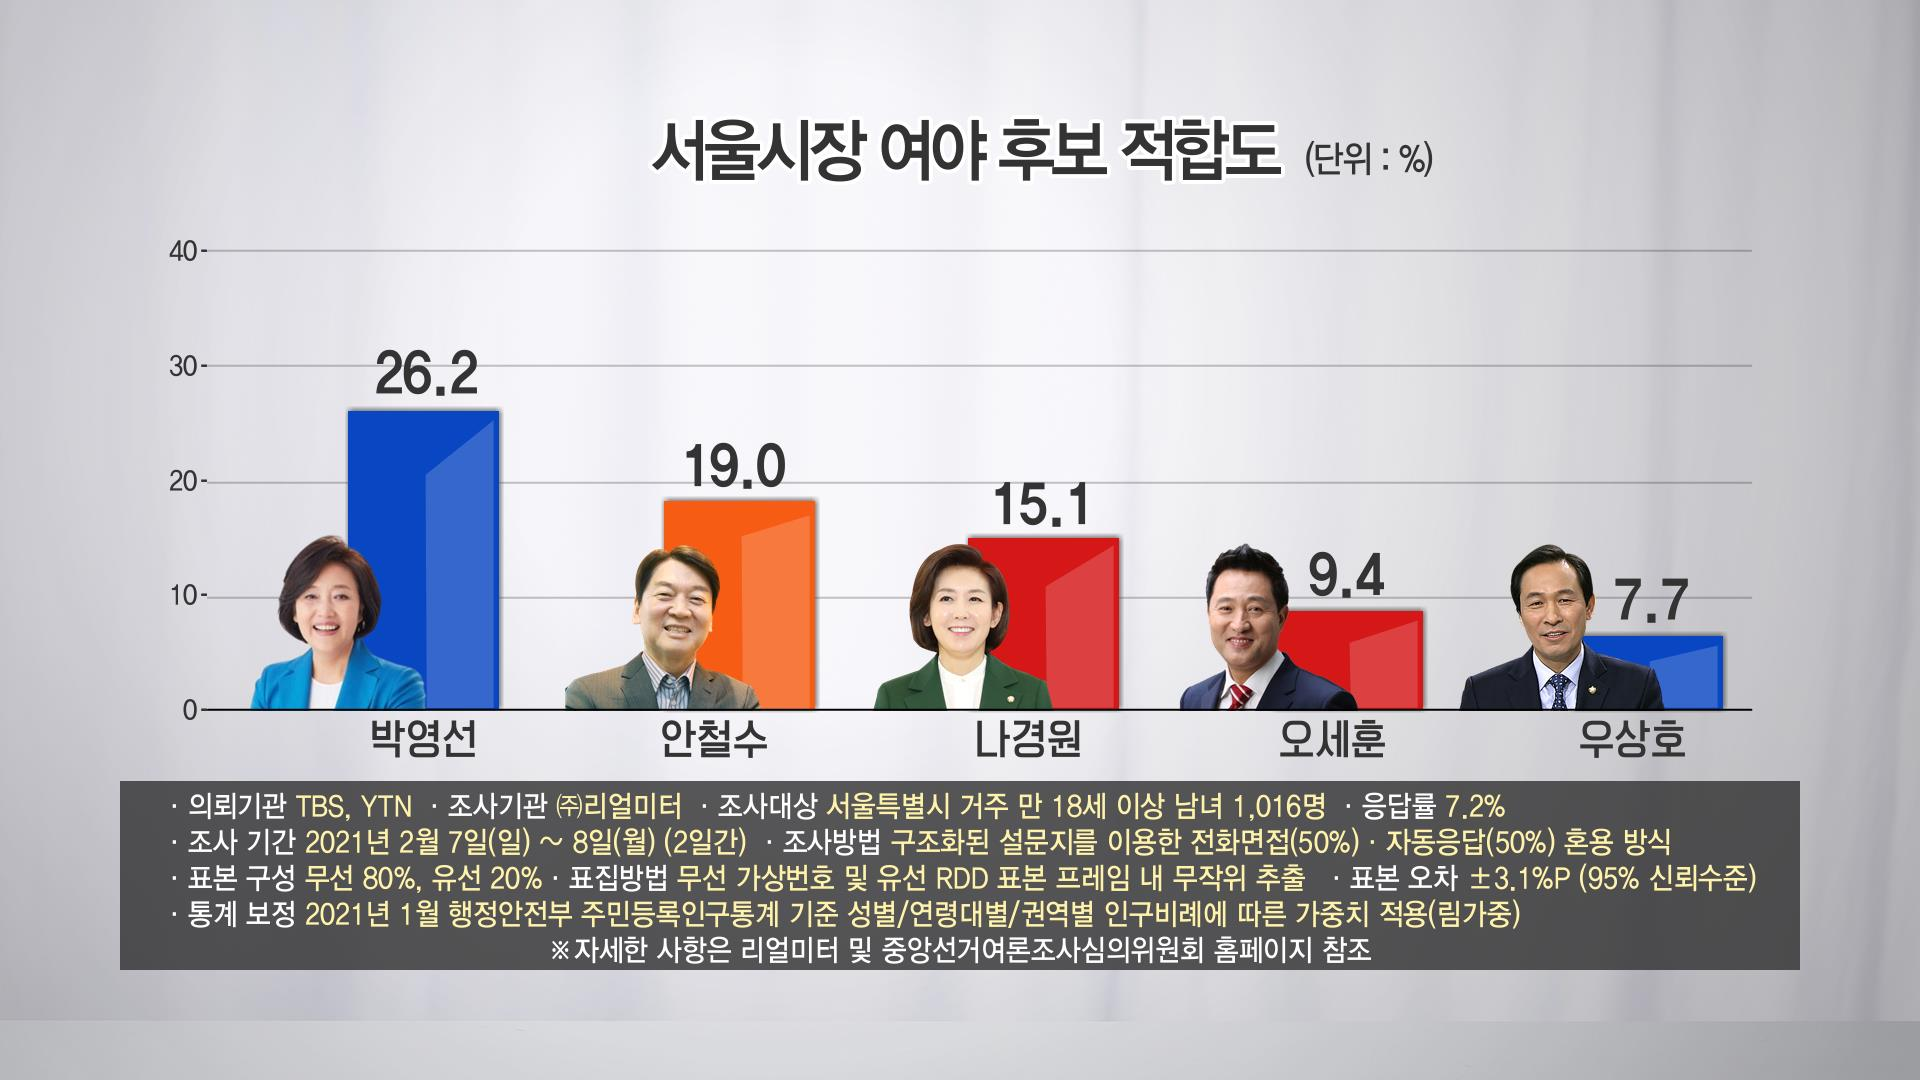 <TBS-YTN 의뢰 리얼미터 2.7~8 조사>